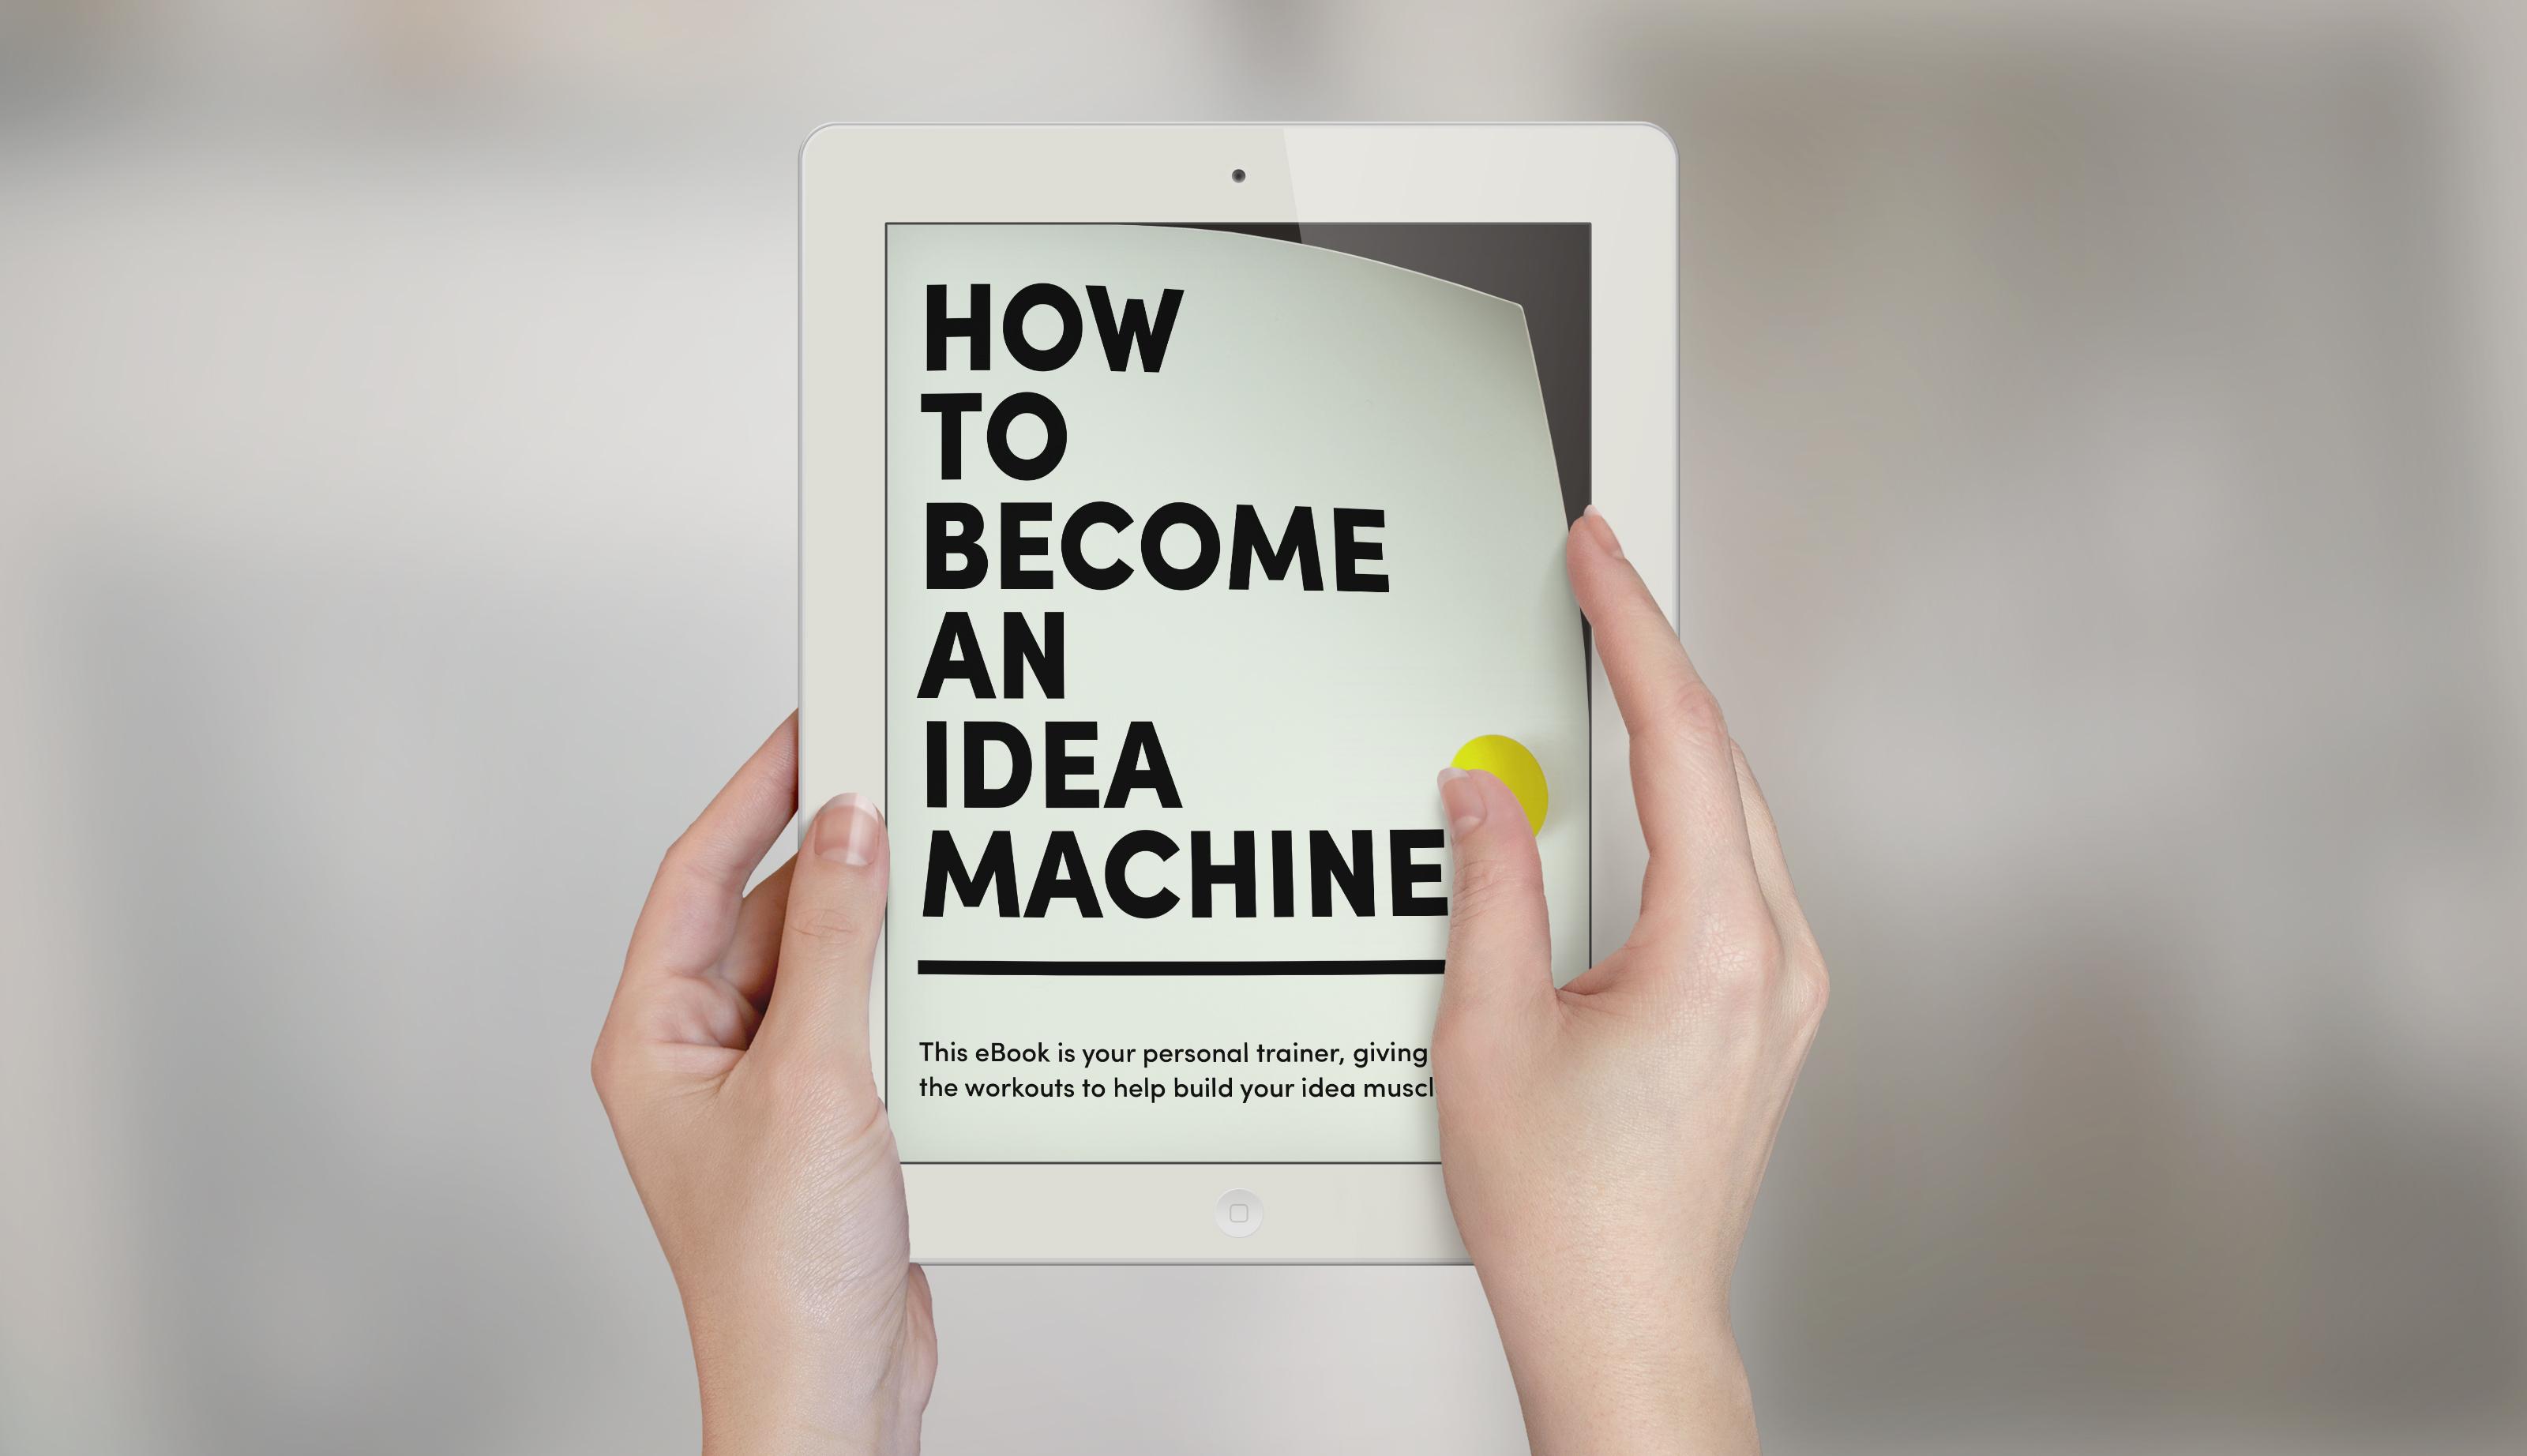 How To Become An Idea Machine Ebook